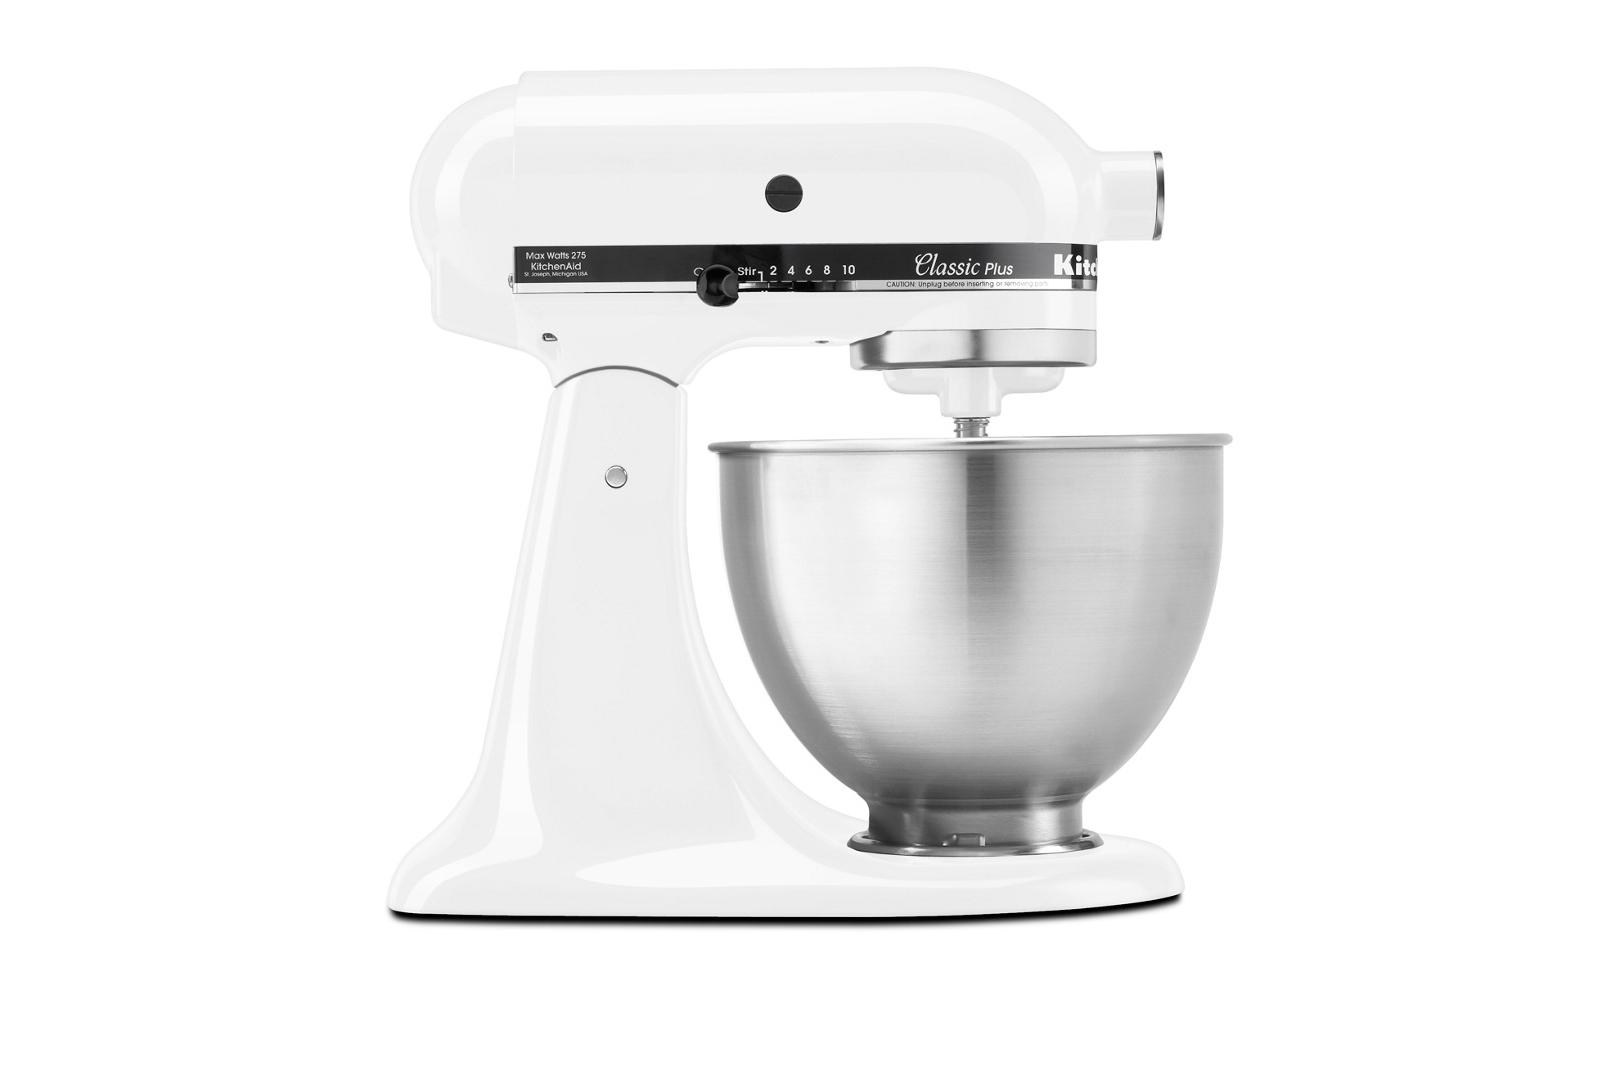 KitchenAid 4.5qt Classic Plus Stand Mixer